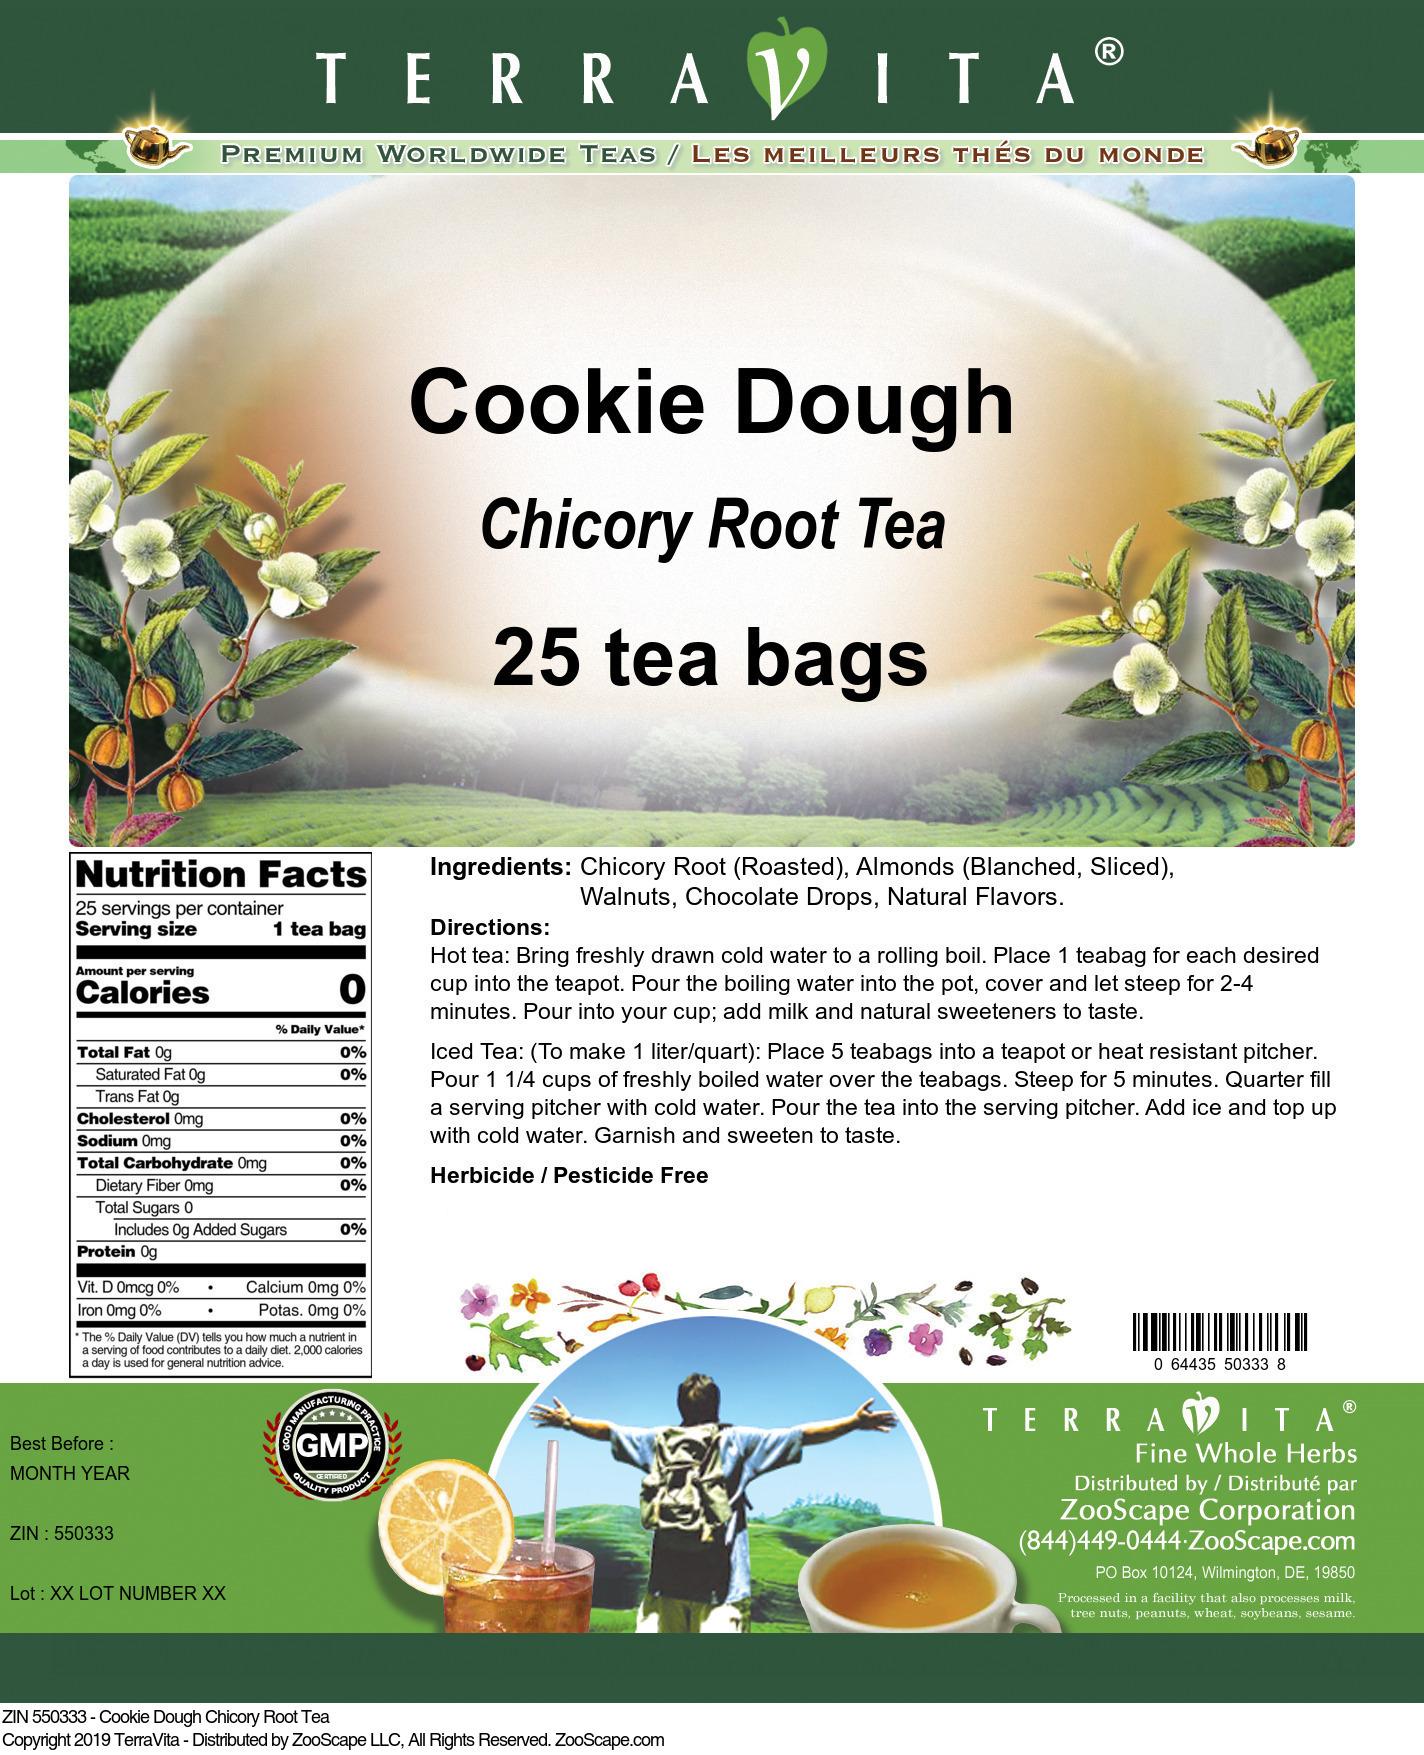 Cookie Dough Chicory Root Tea